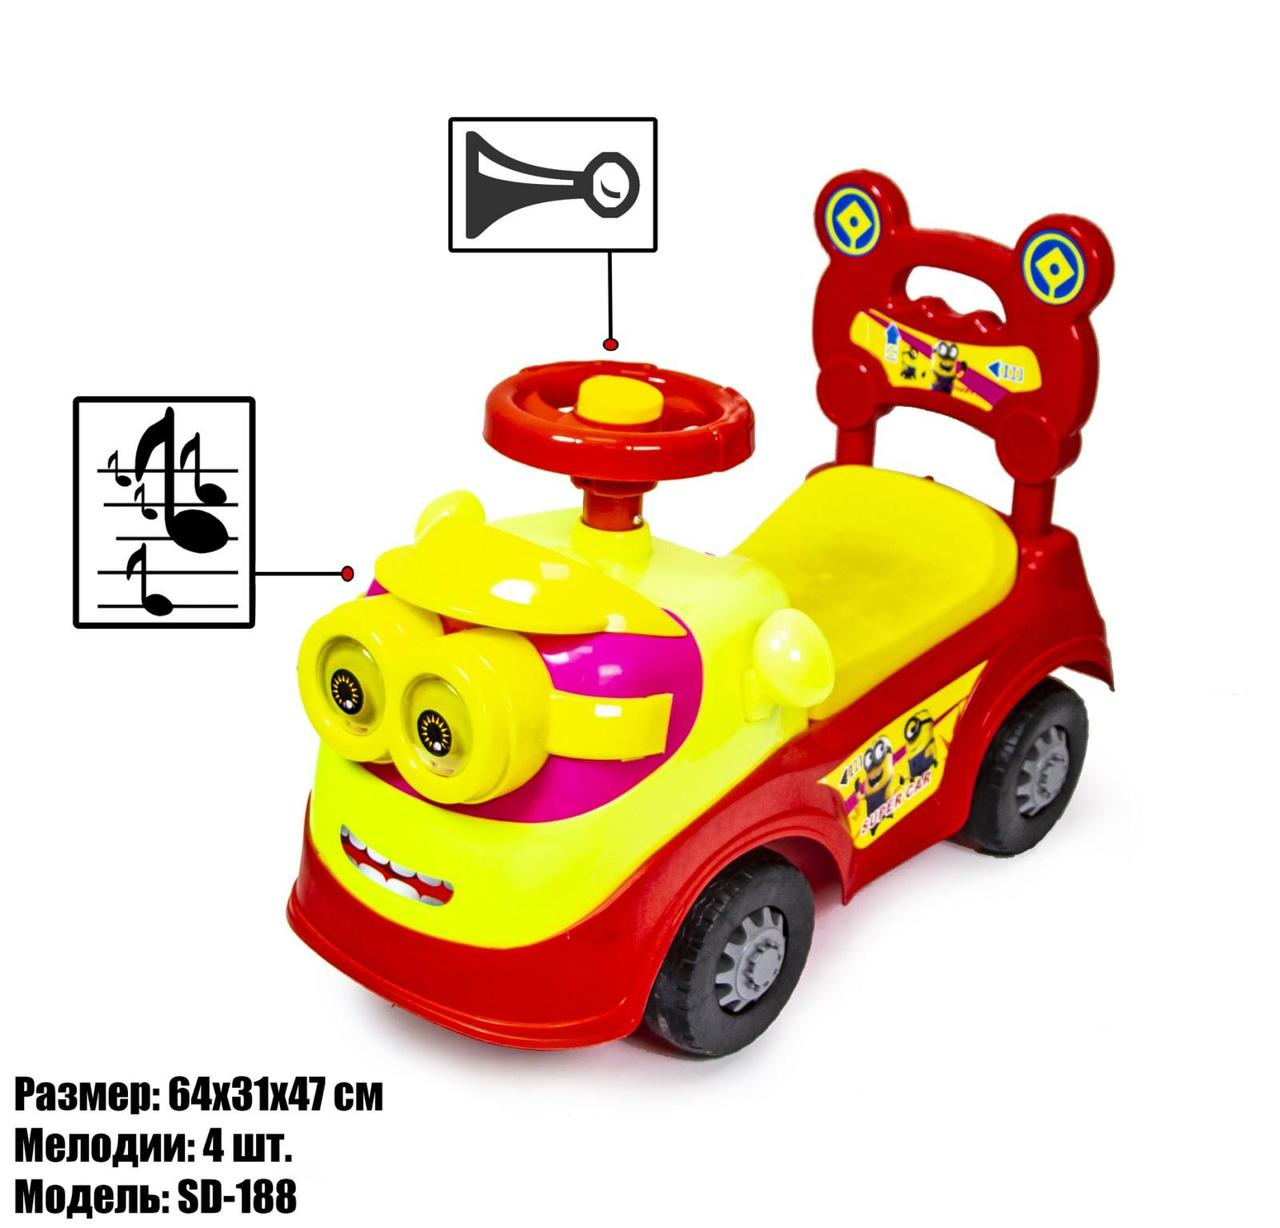 Машинка каталка толокар Миньон 188 красный